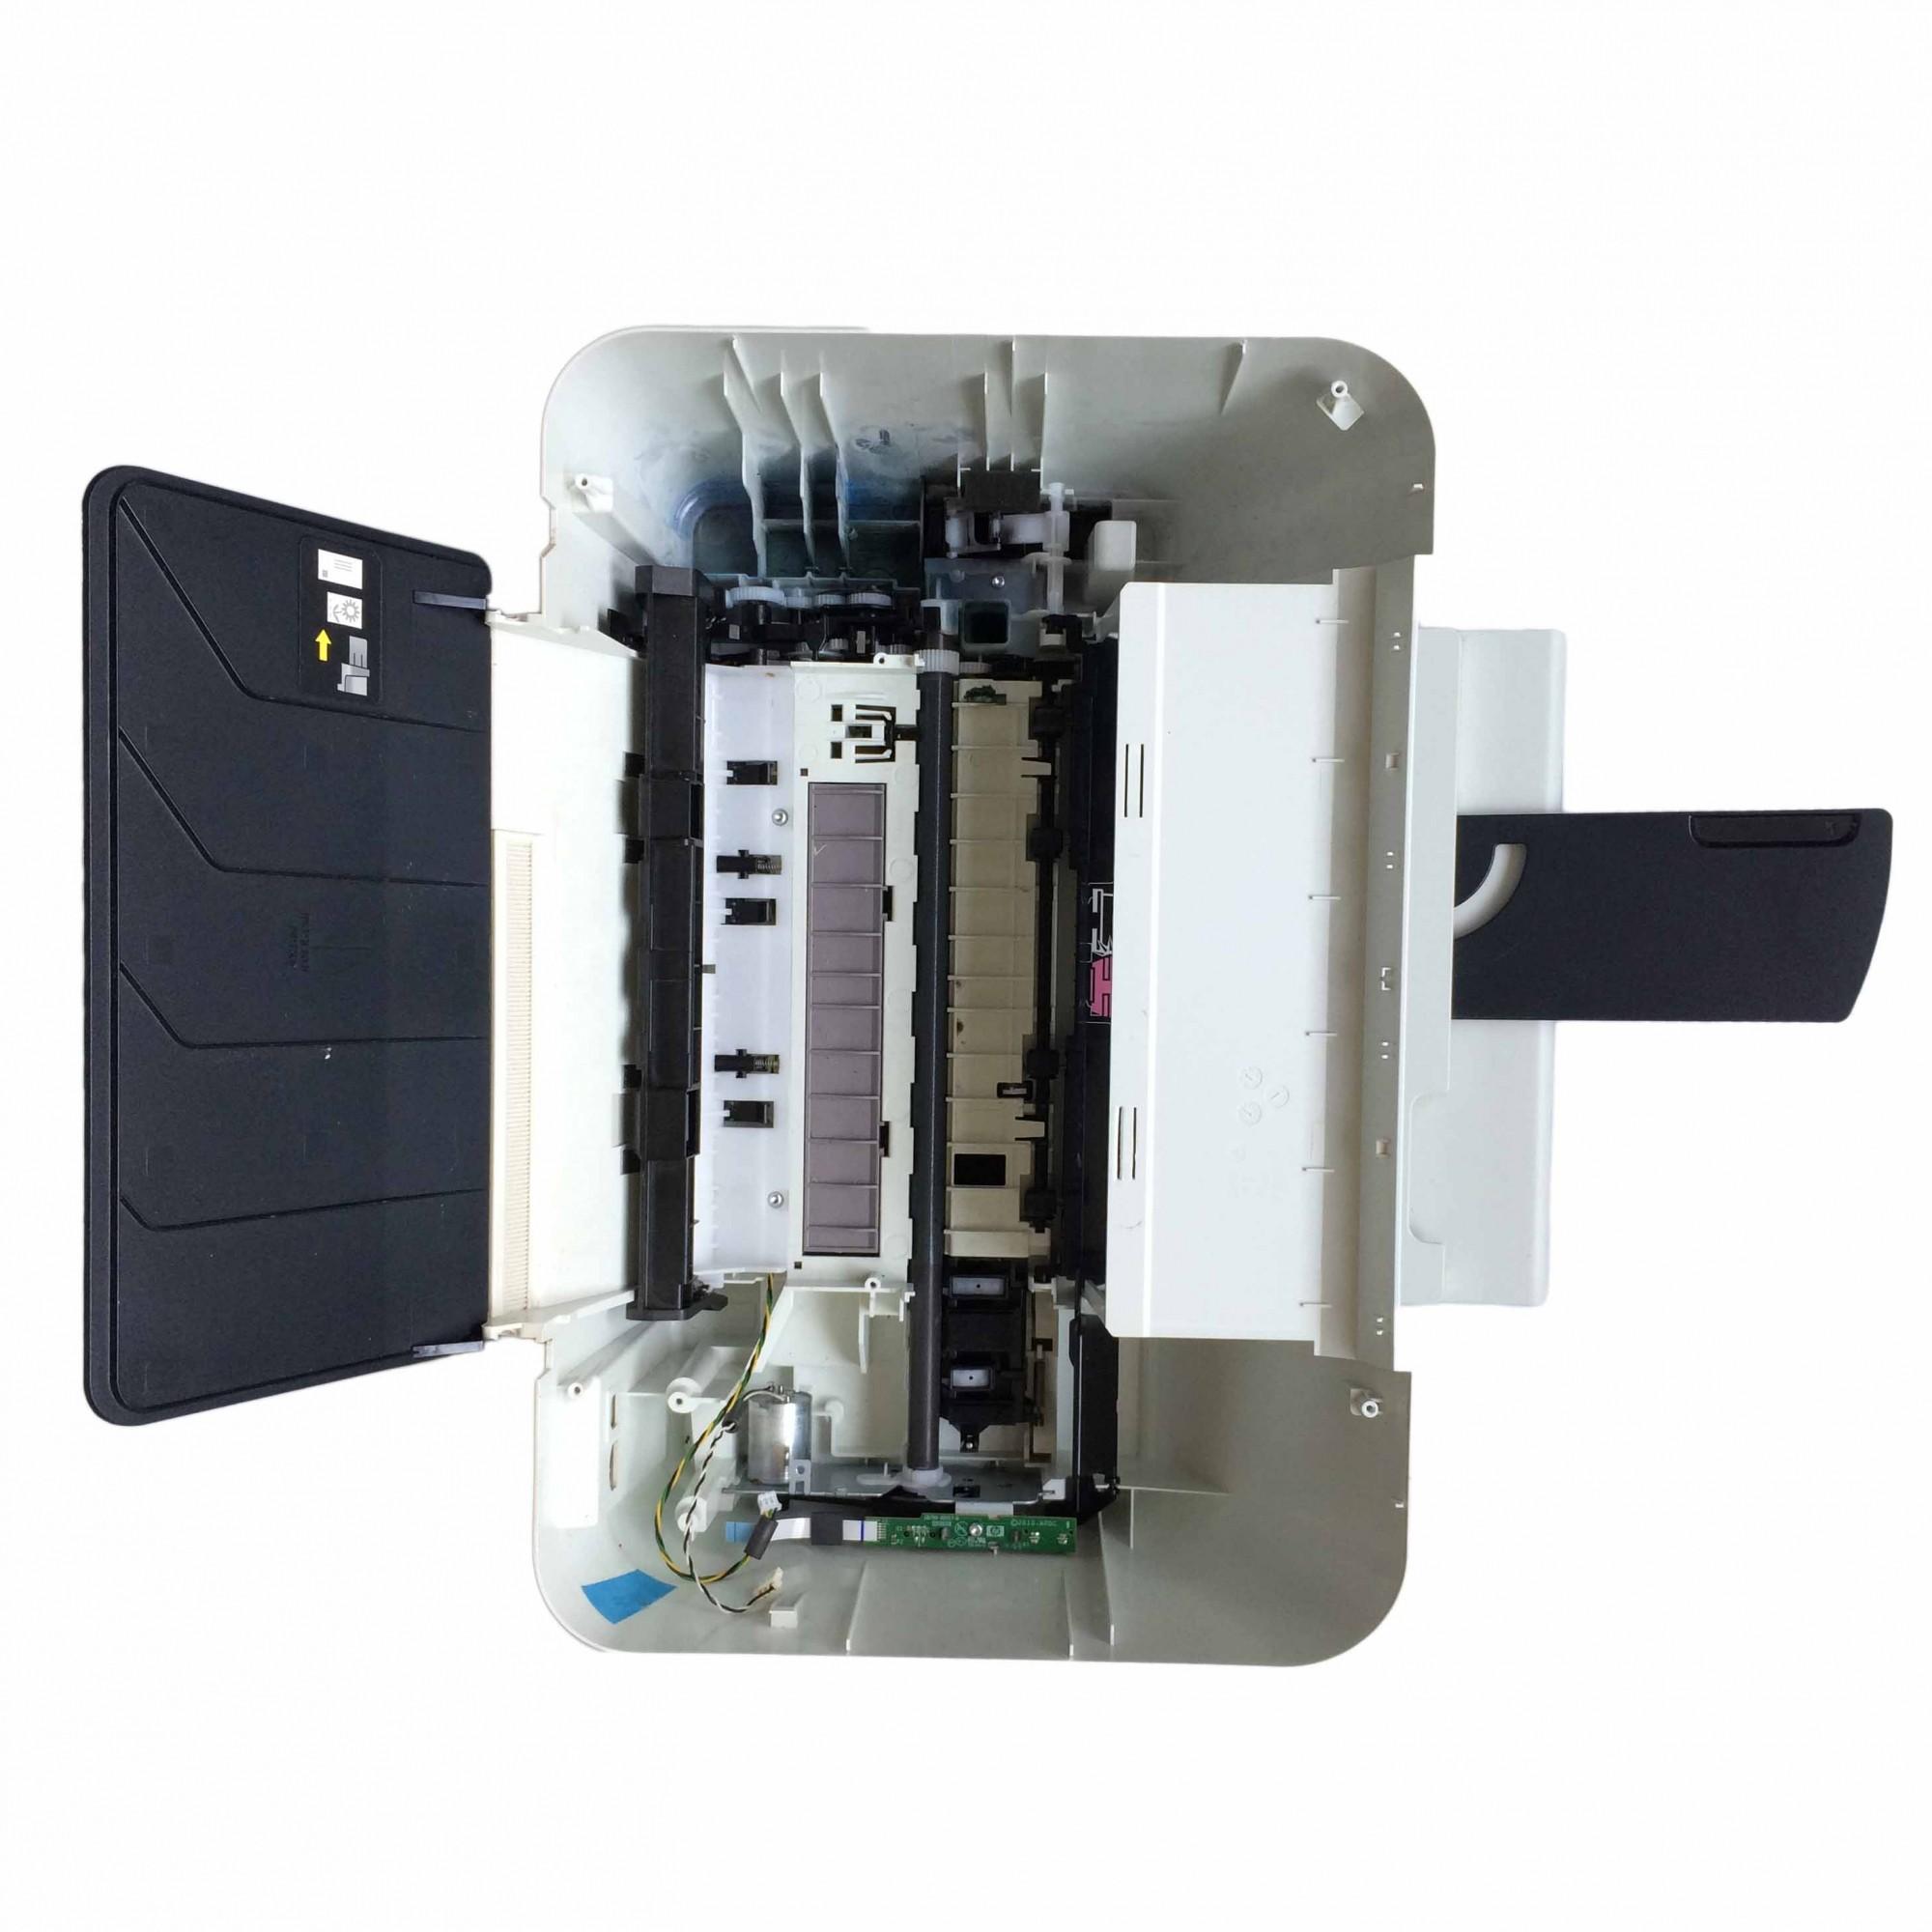 Carcaça Base C/ Mecânismo Completo Multifuncional HP Deskjet Ink Advantage 1516 - Retirado